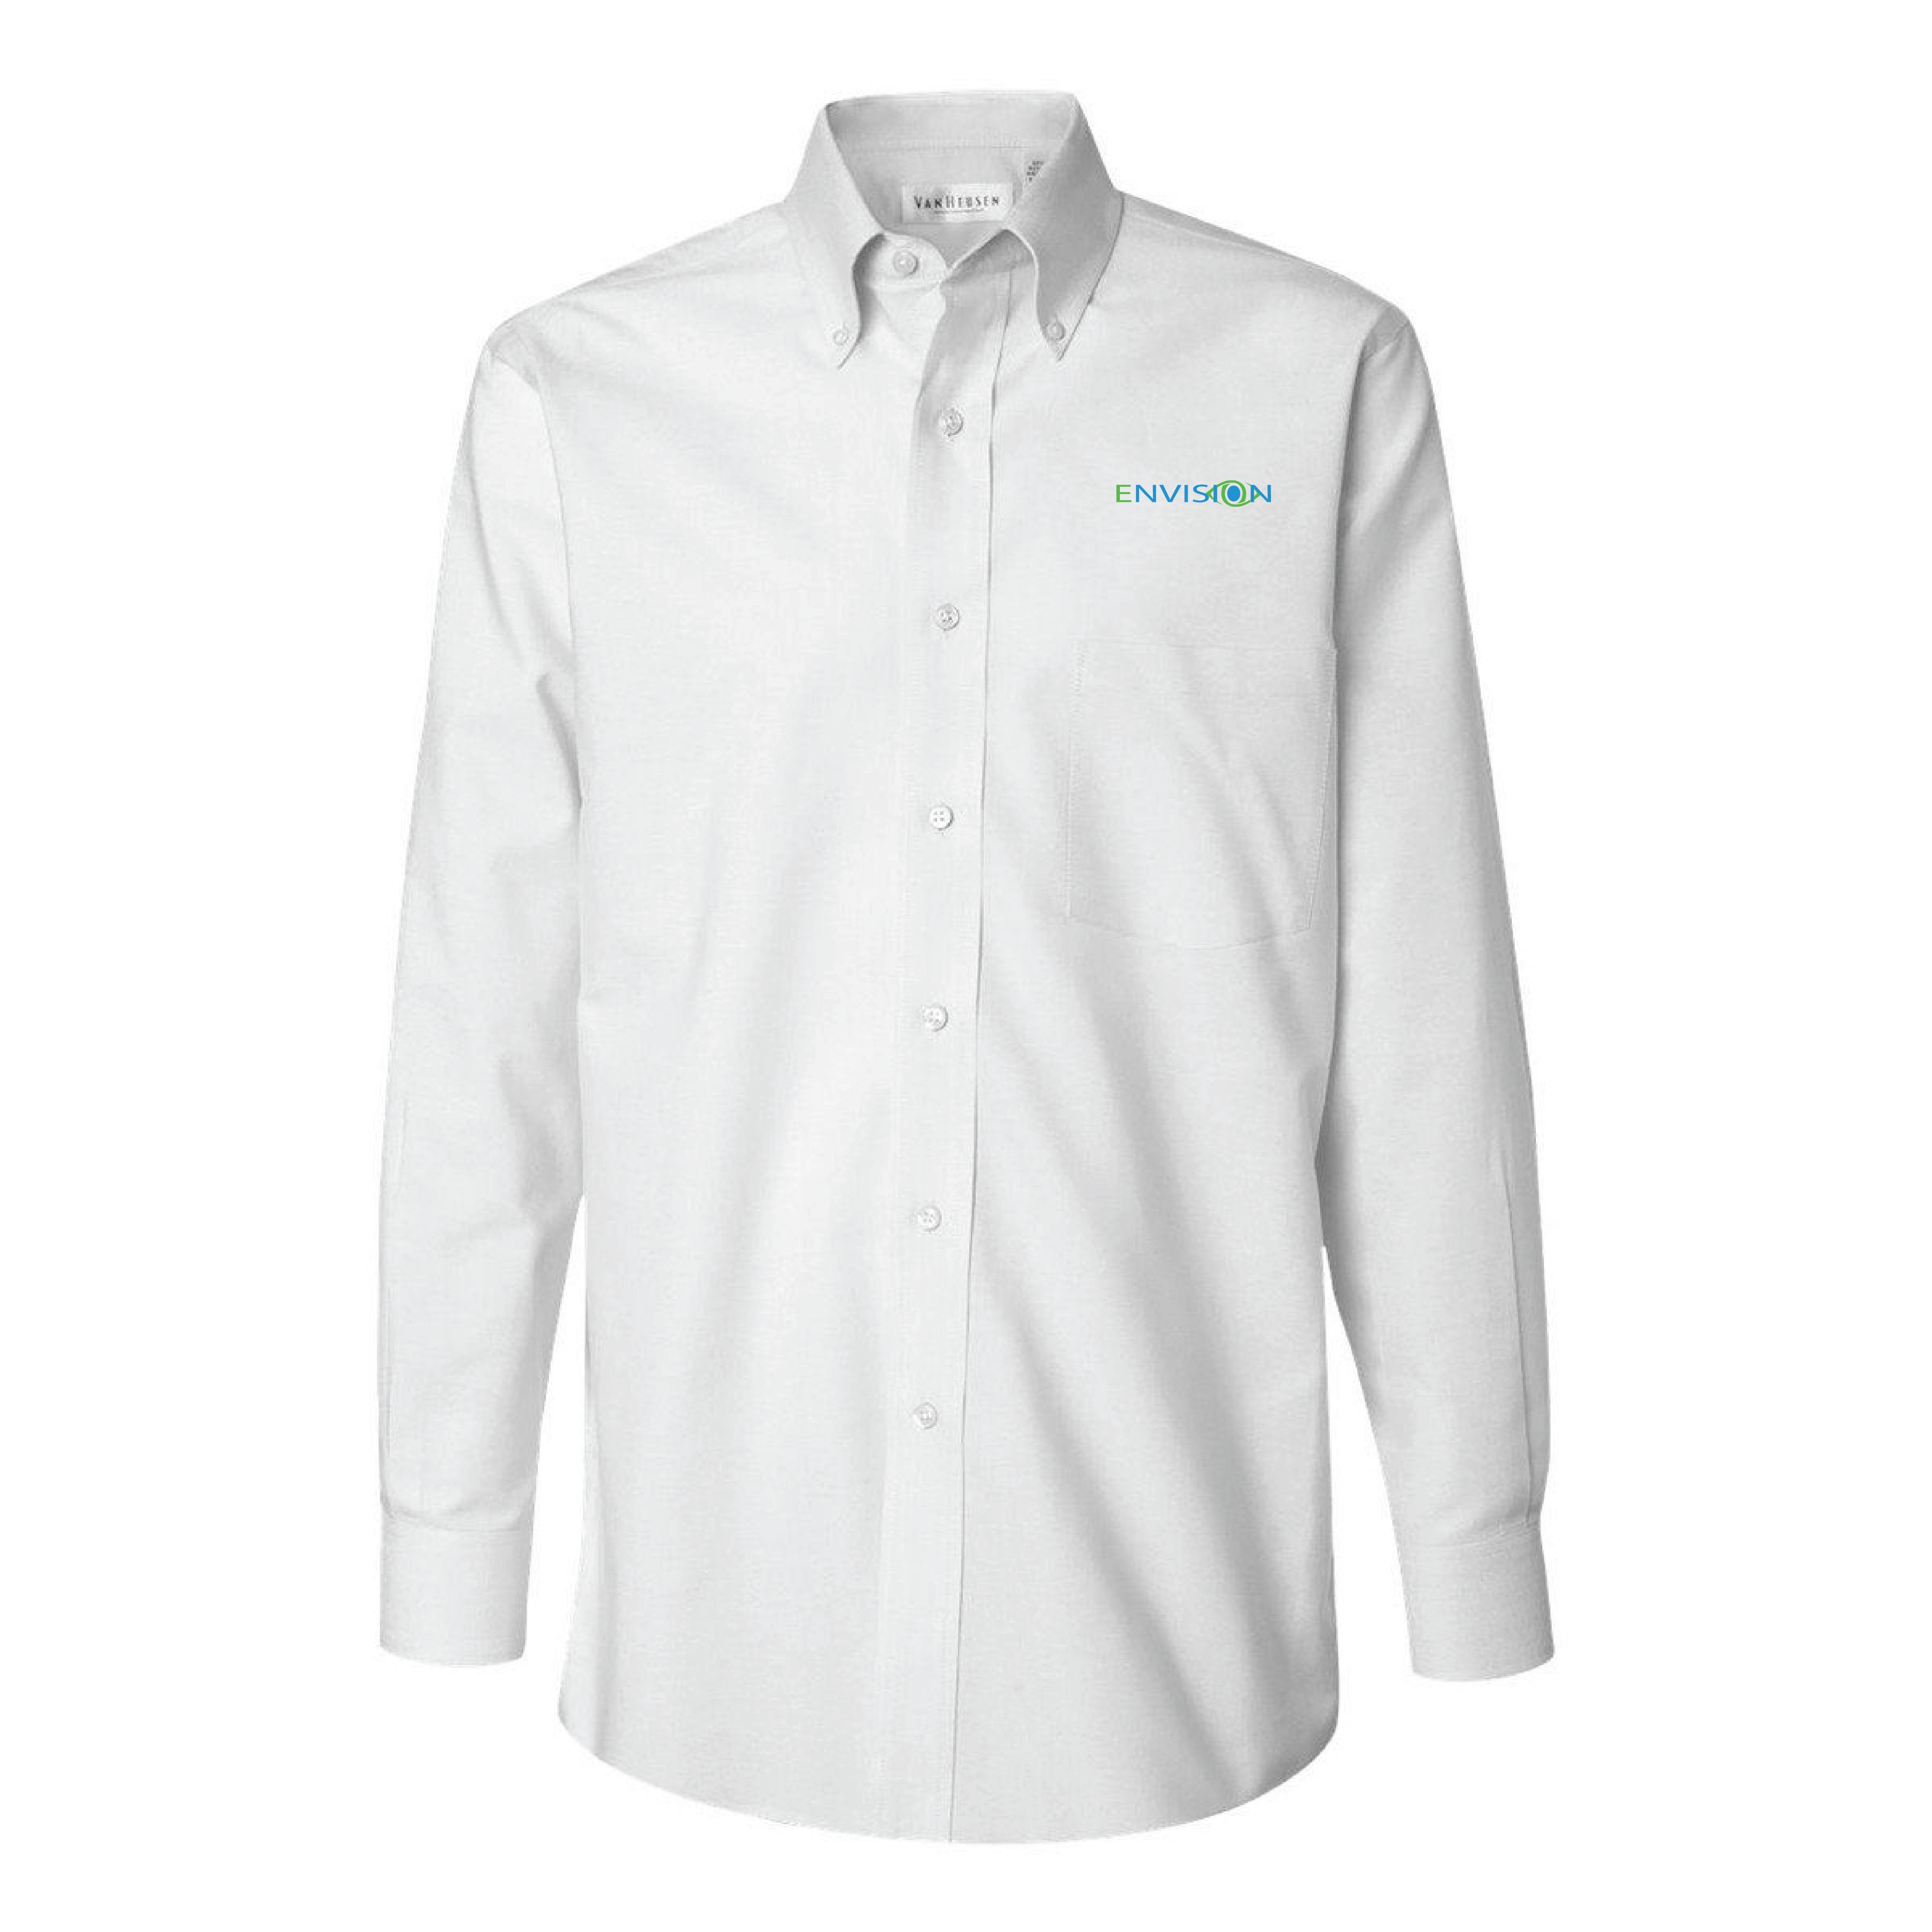 1ae2f7150ba Envision Mens Button Down: Van Heusen Men's Long Sleeve Oxford Shirt-Alpha  Sized (4 Colors)